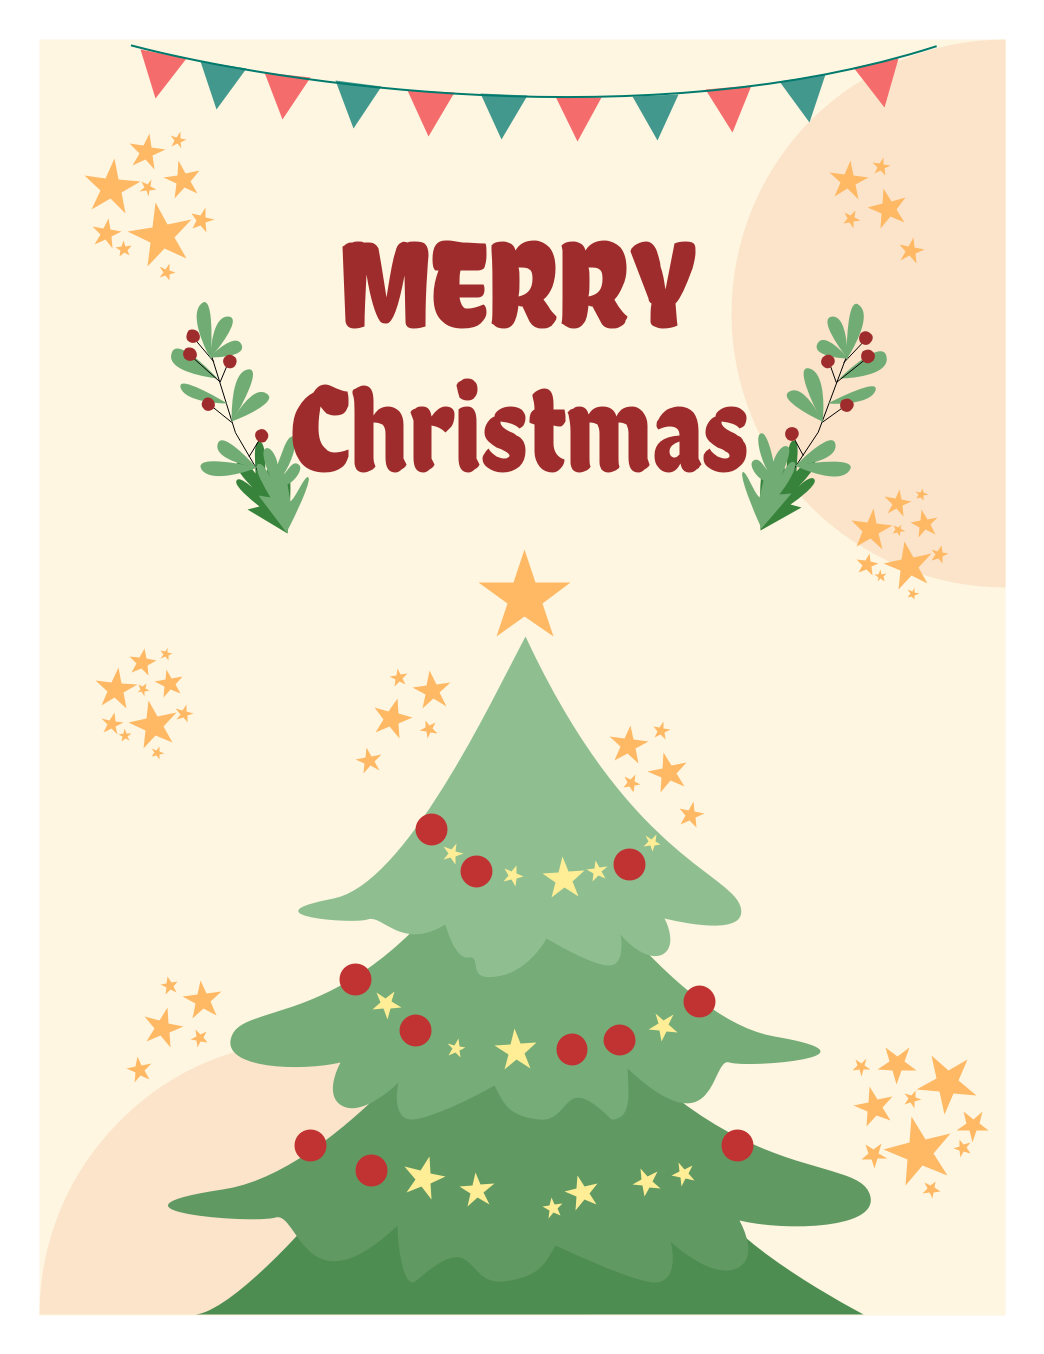 Beautiful Christmas Card Template Template Christmas Tree Cards Christmas Card Template Beautiful Christmas Cards